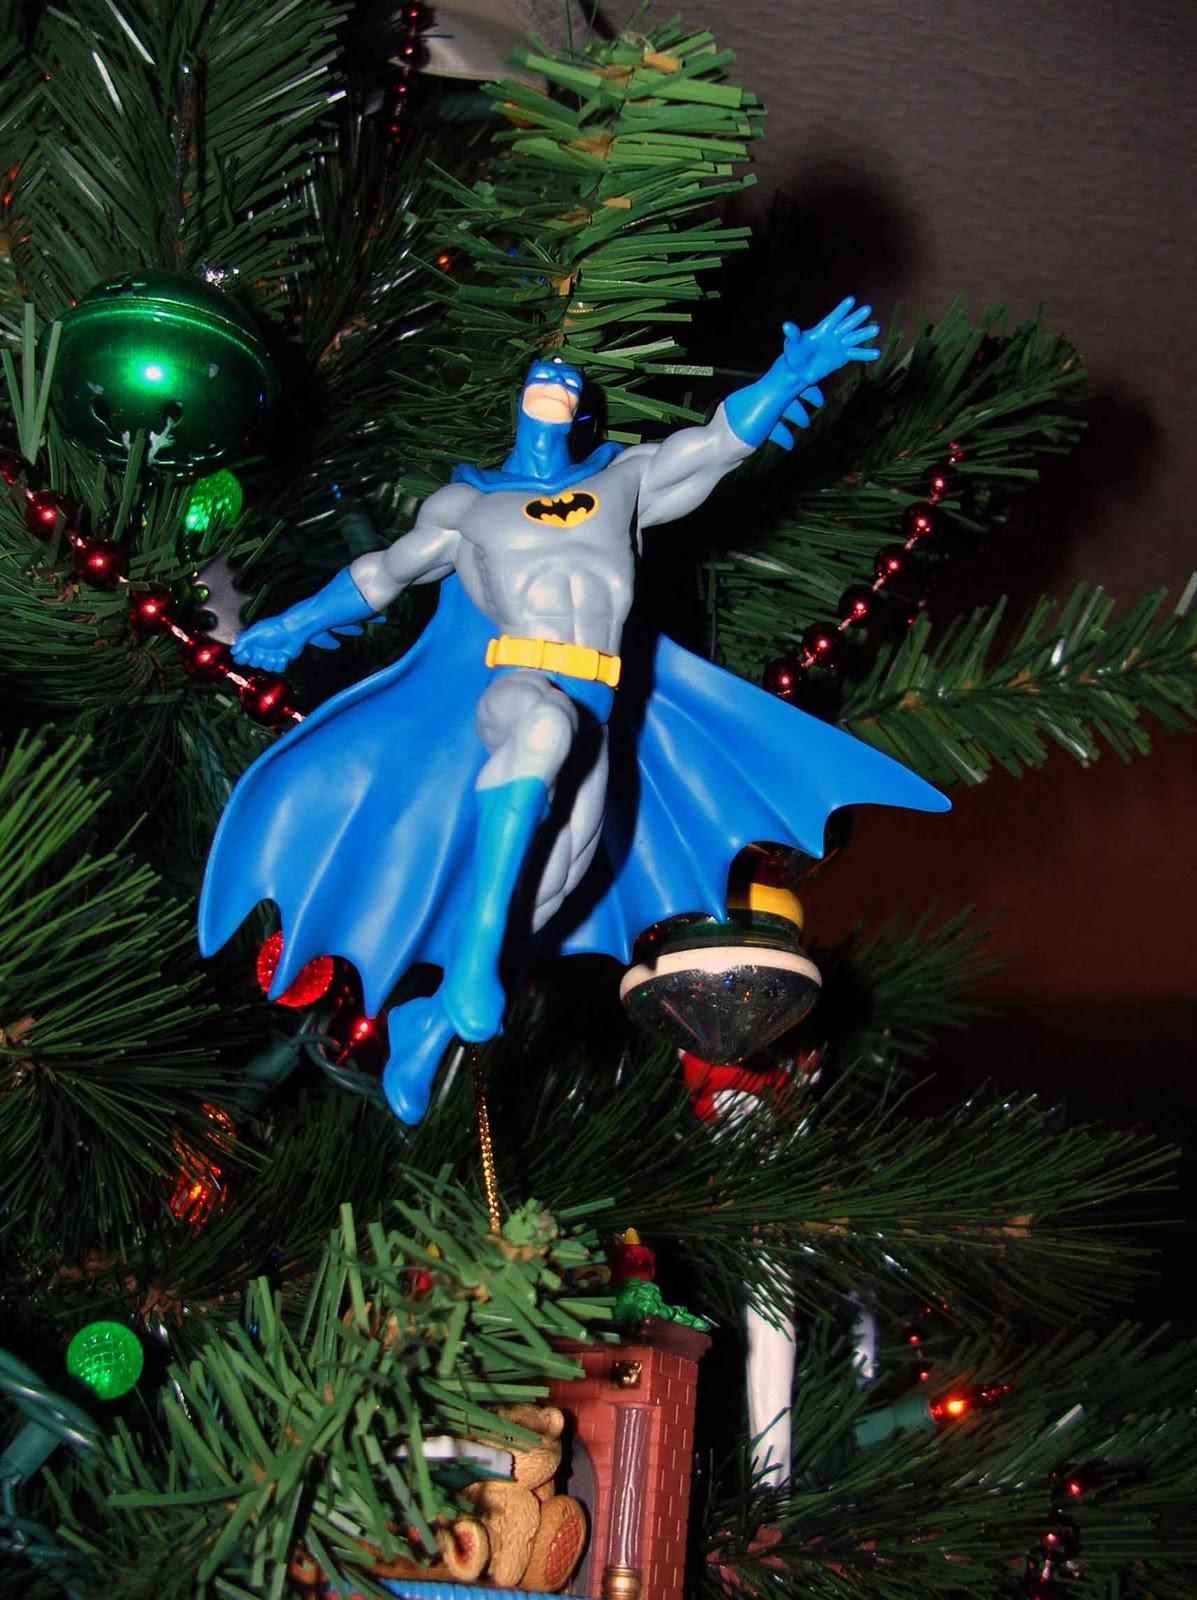 Batman christmas tree ornaments - Catwoman